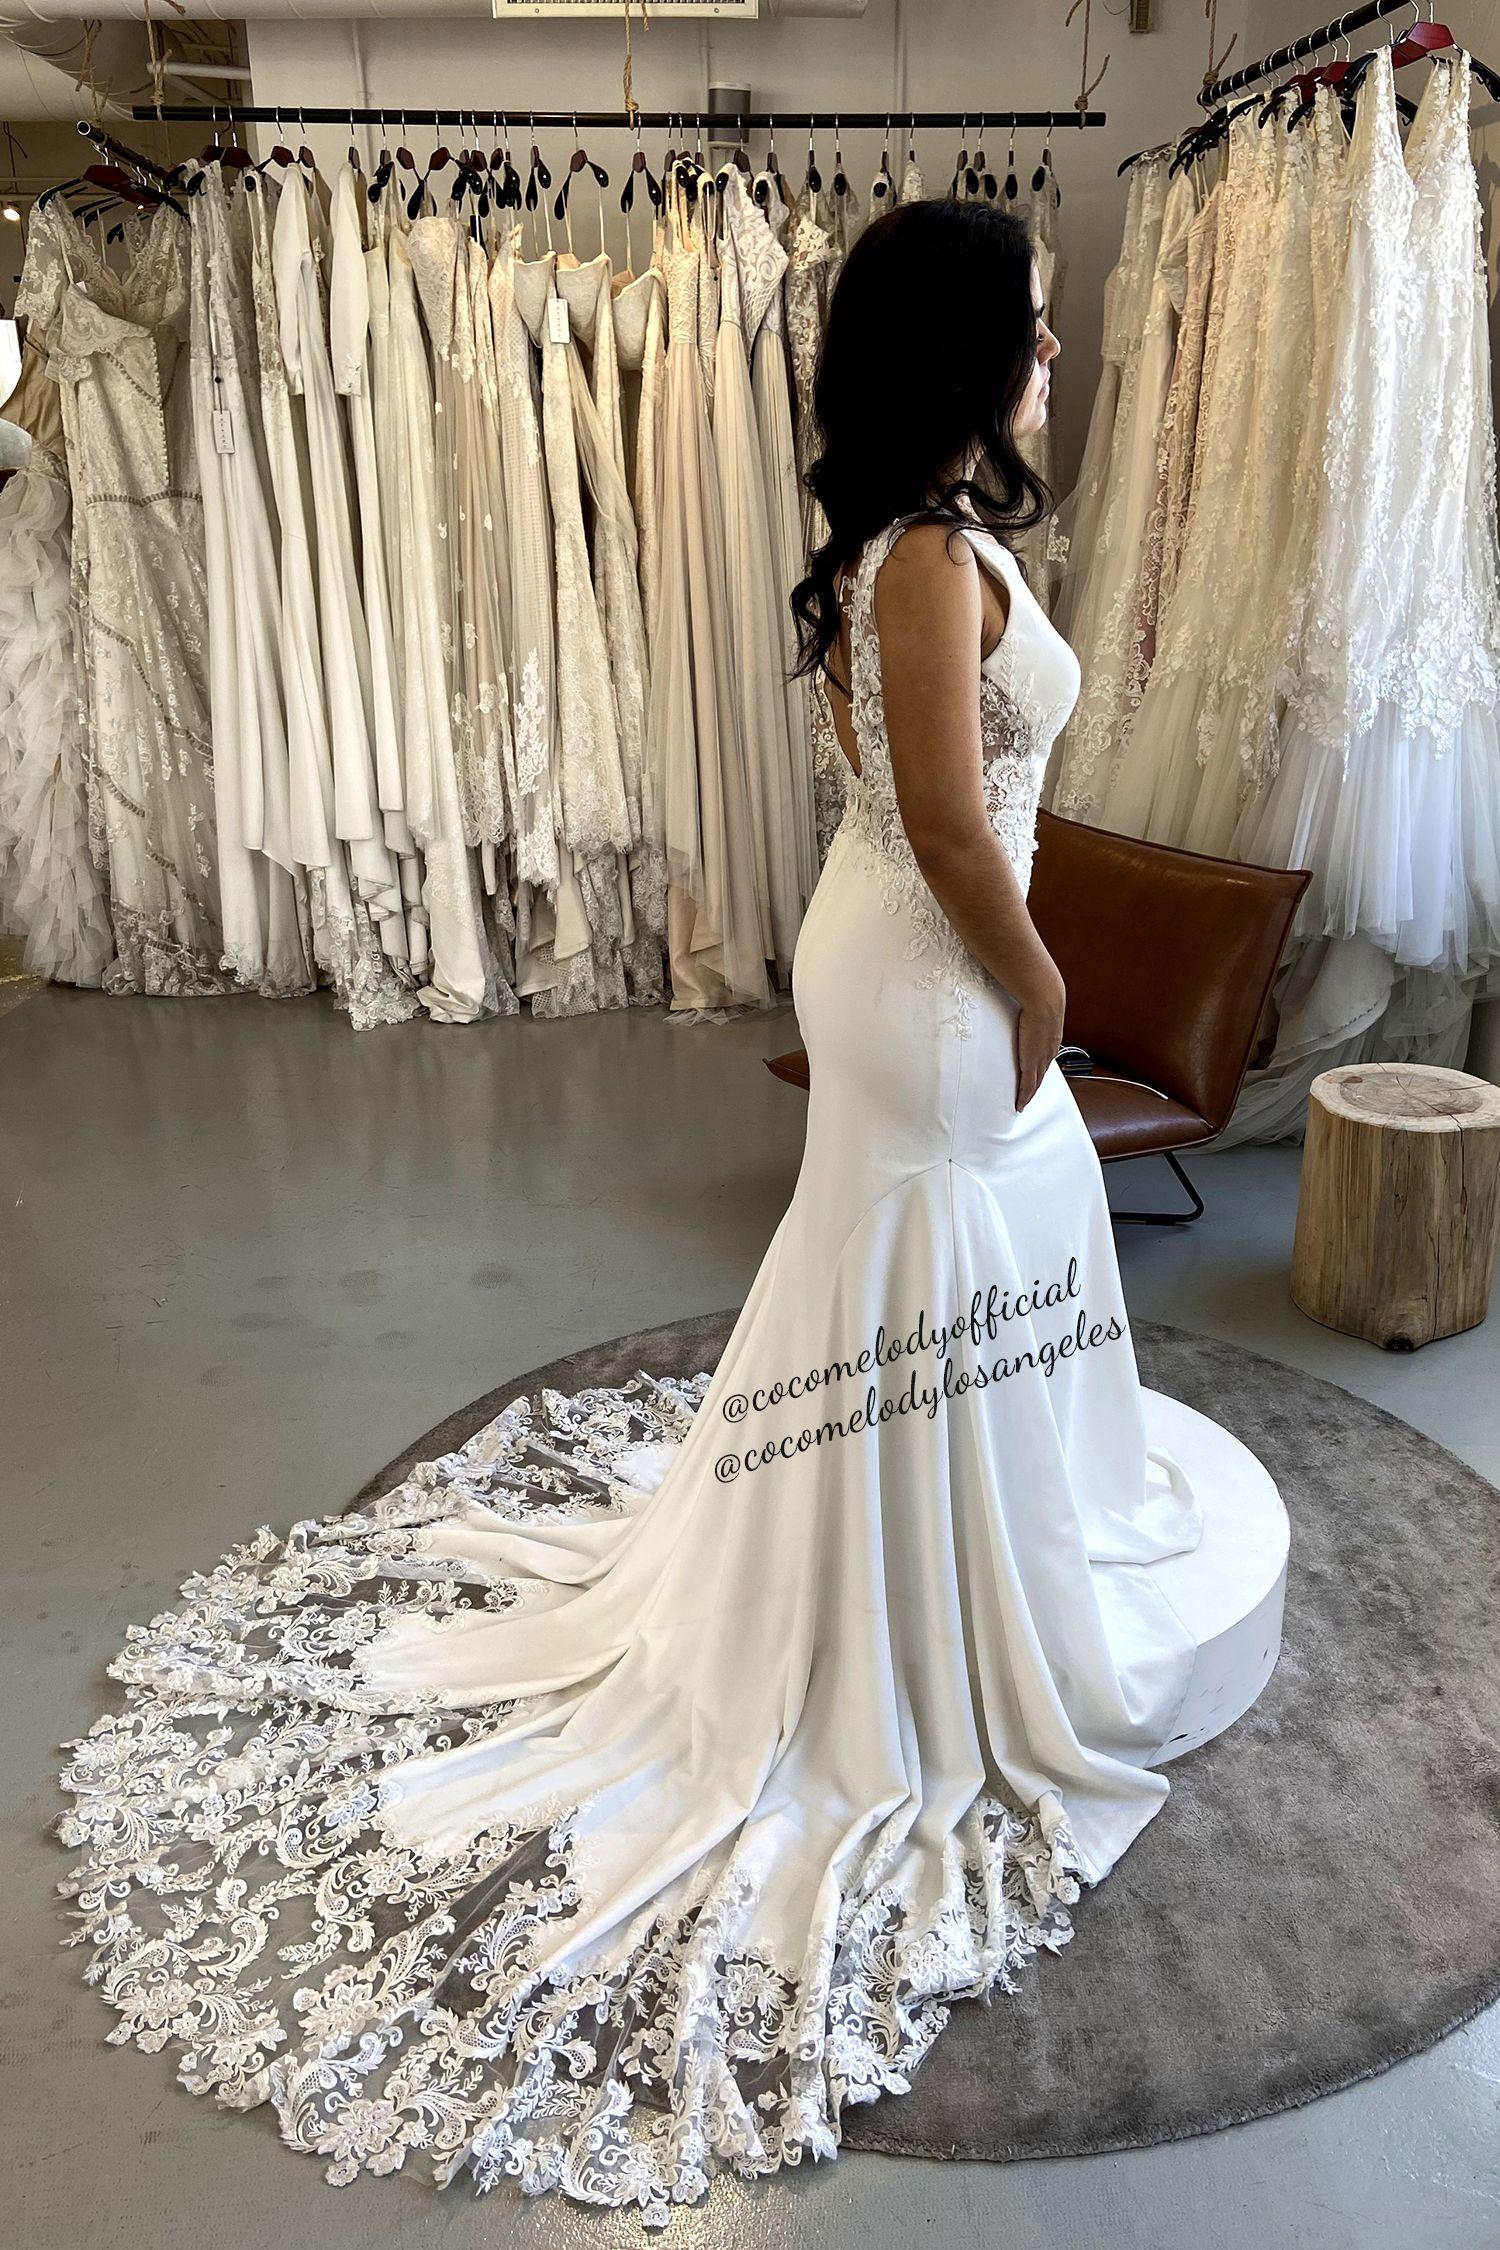 Usd 799 Graceful Bateau Court Train Zipper Wedding Dress Ld5818 In 2020 Wedding Dresses Dresses Dream Wedding Dresses